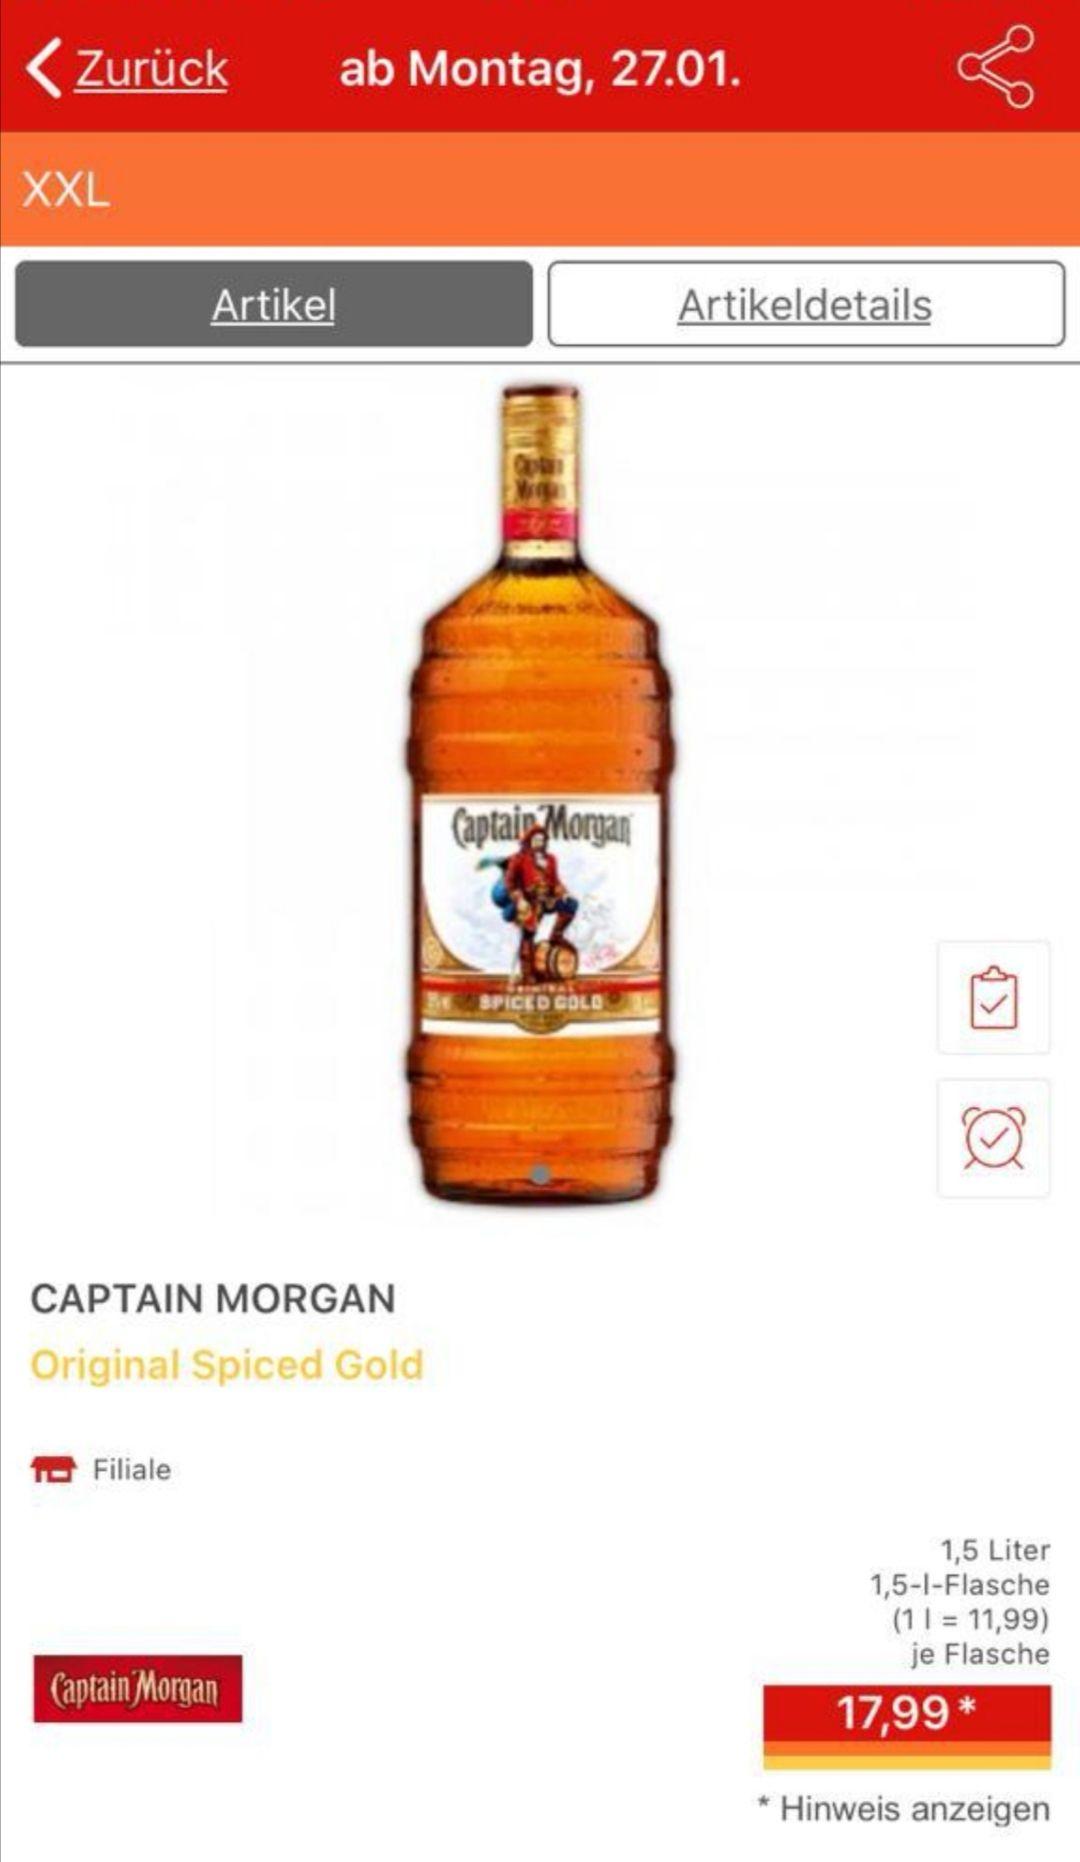 [Norma] Captain Morgan Original Spiced Gold XXL 1,5 Liter 17,99; 11,99 Literpreis (evtl. Lokal)